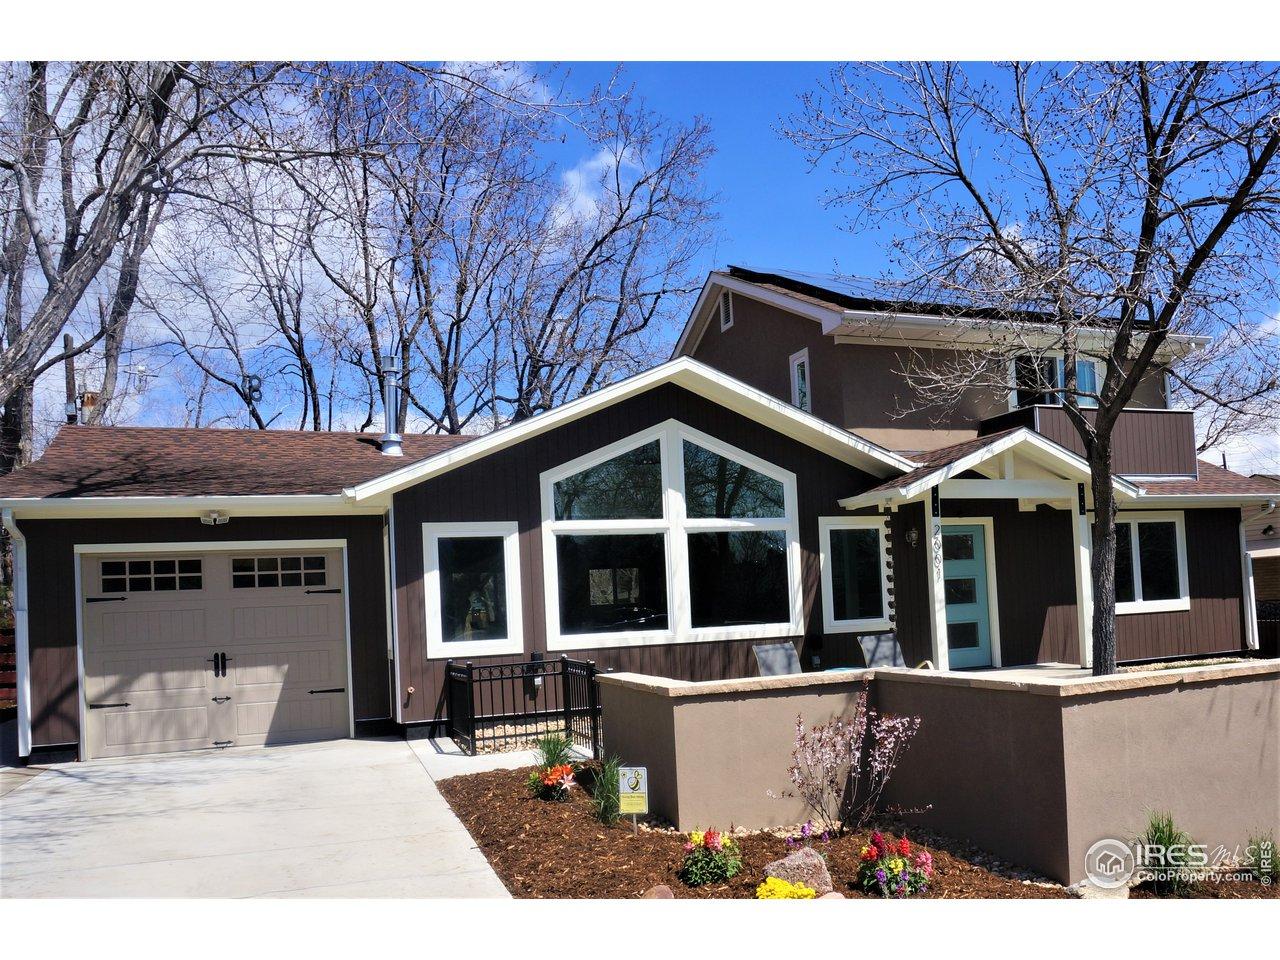 2001 Evergreen Ave, Boulder CO 80304